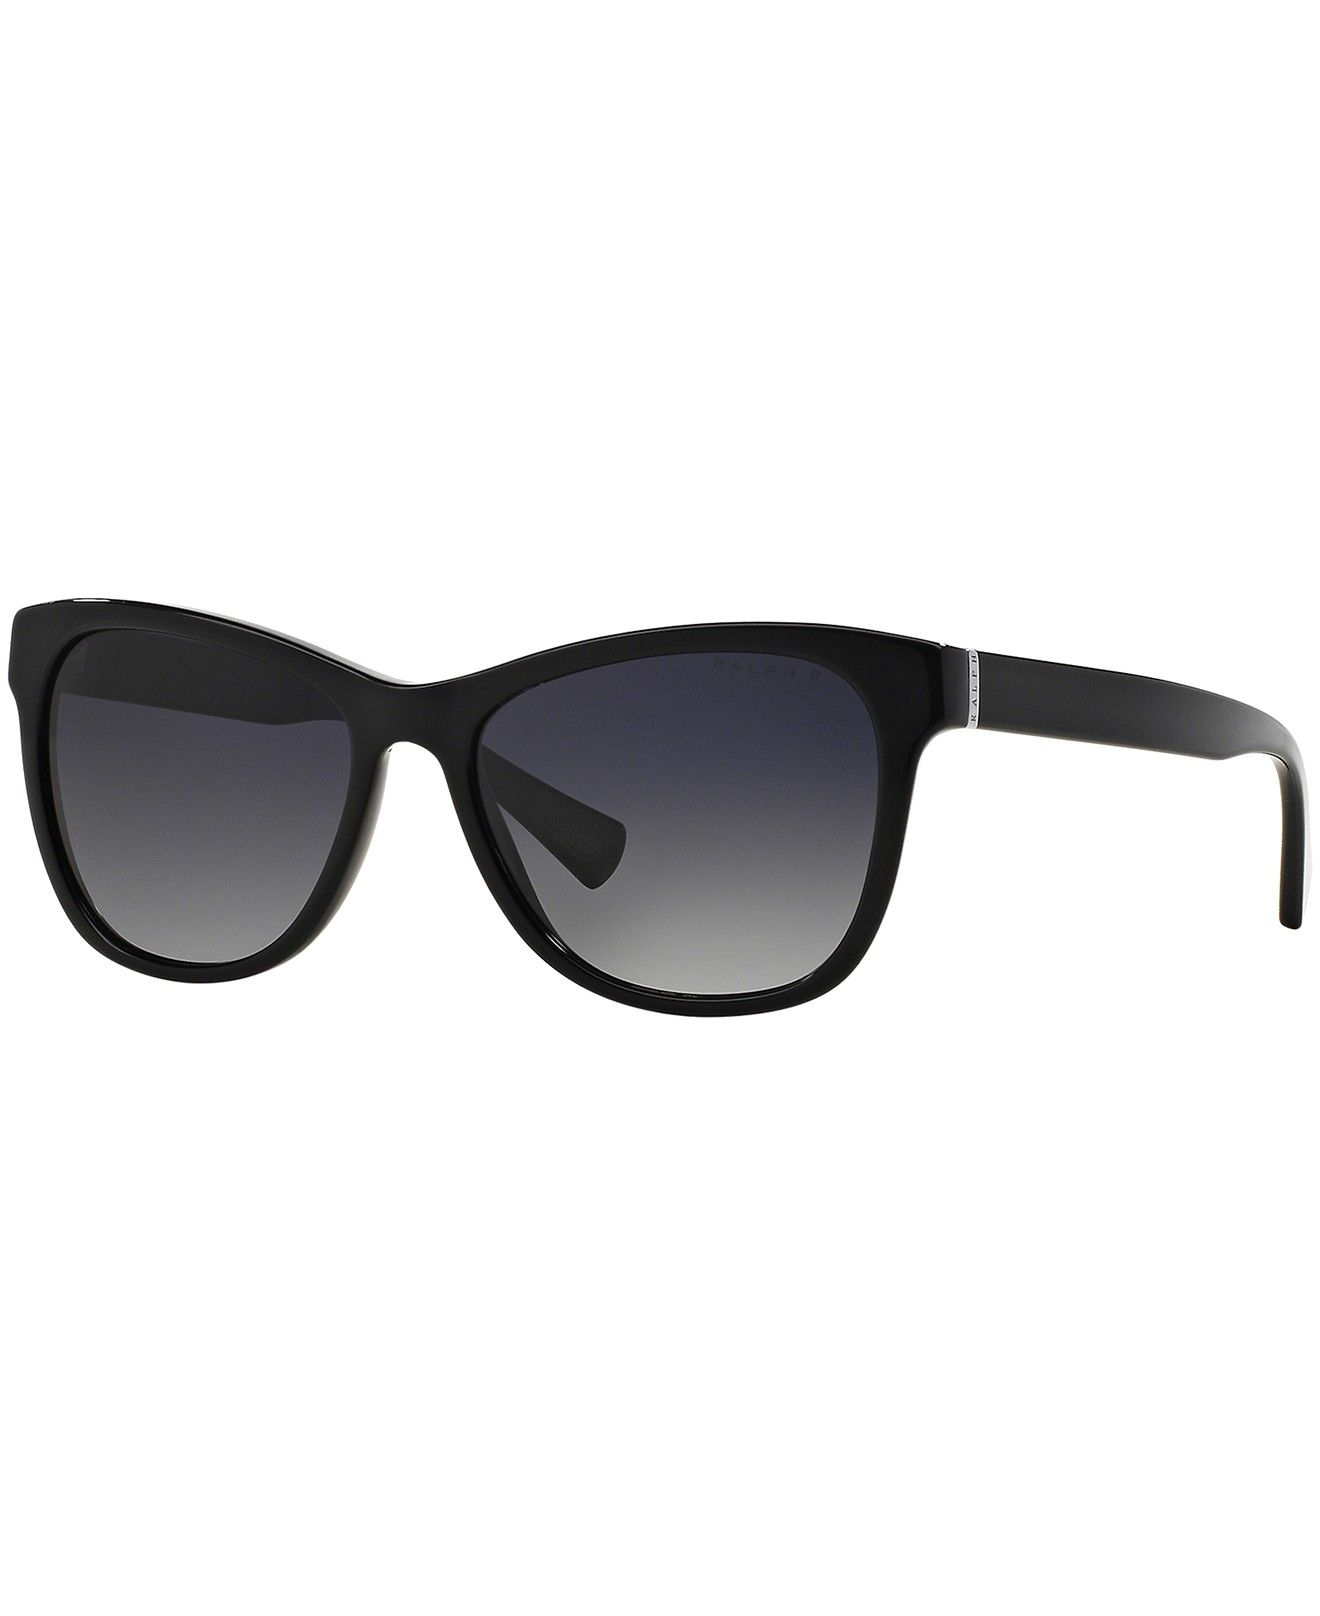 Ralph Polarized Sunglasses, RA5196 - Sunglasses by Sunglass Hut - Handbags  & Accessories - Macy's